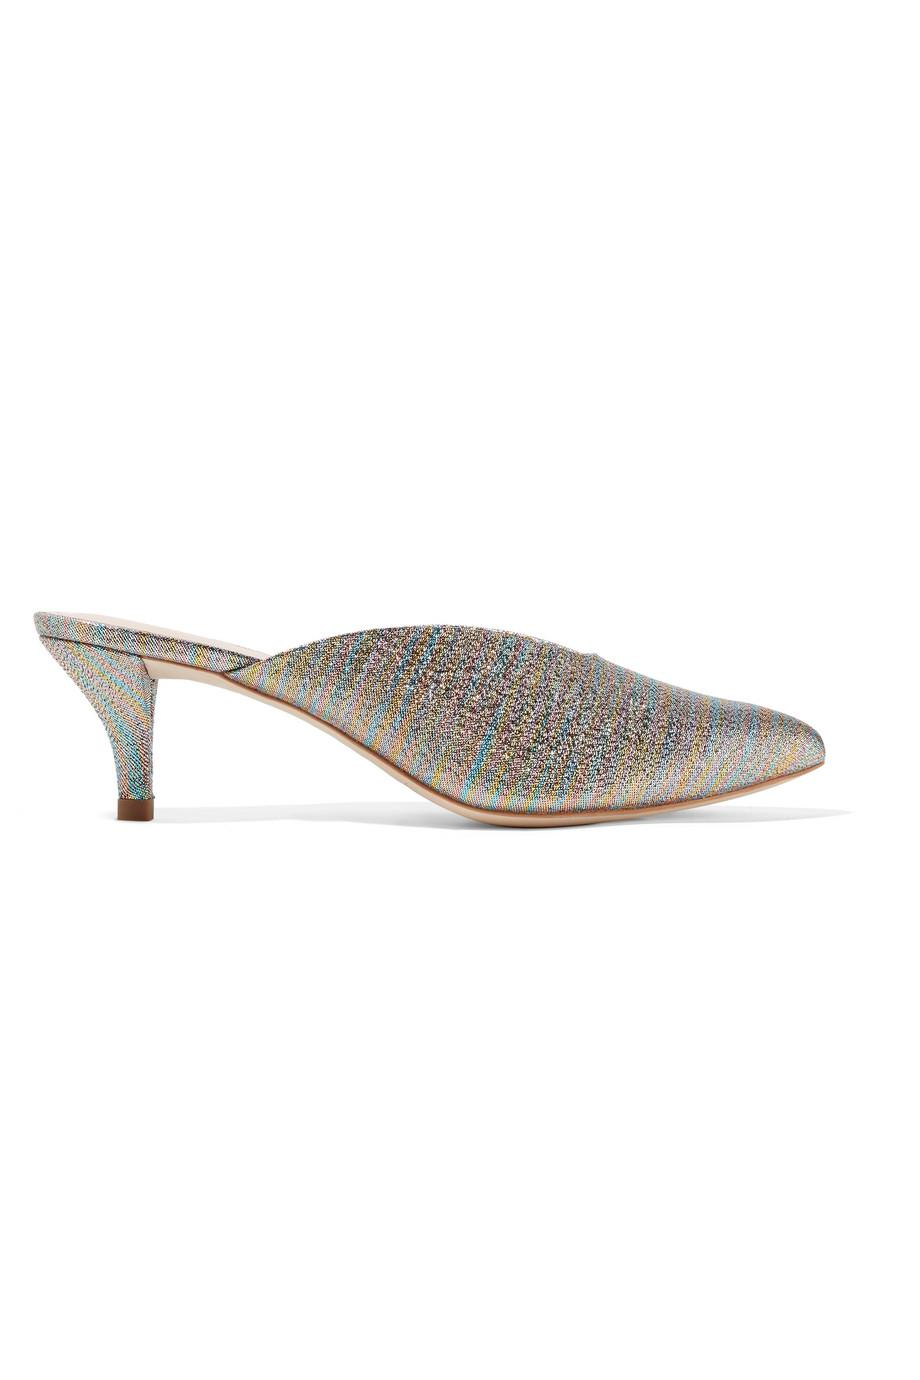 Juno Textured-lamé Mules - Gold Loeffler Randall aprHlo